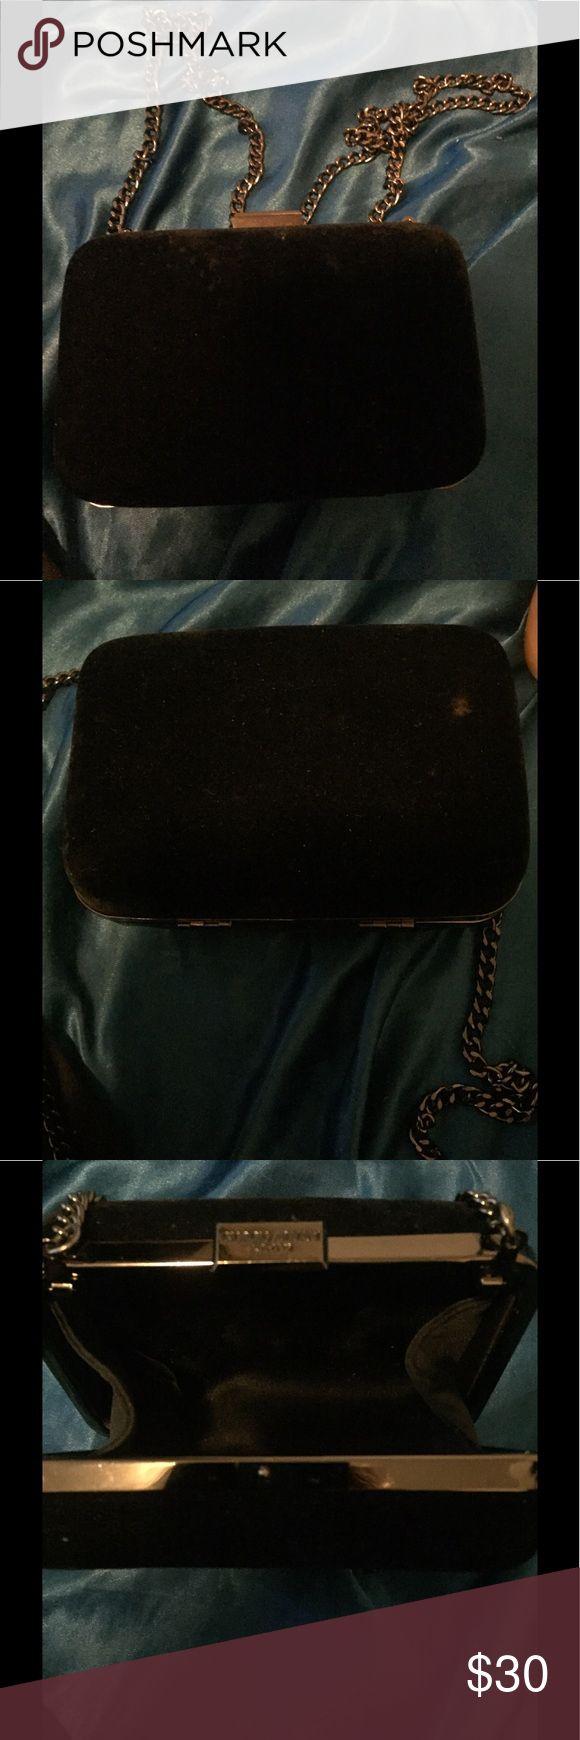 GEORGIO ARMANI PARFUMS Black velvet clutch w chain beauriful armani perfumes purse velvet with long chain armani perfums Bags Crossbody Bags